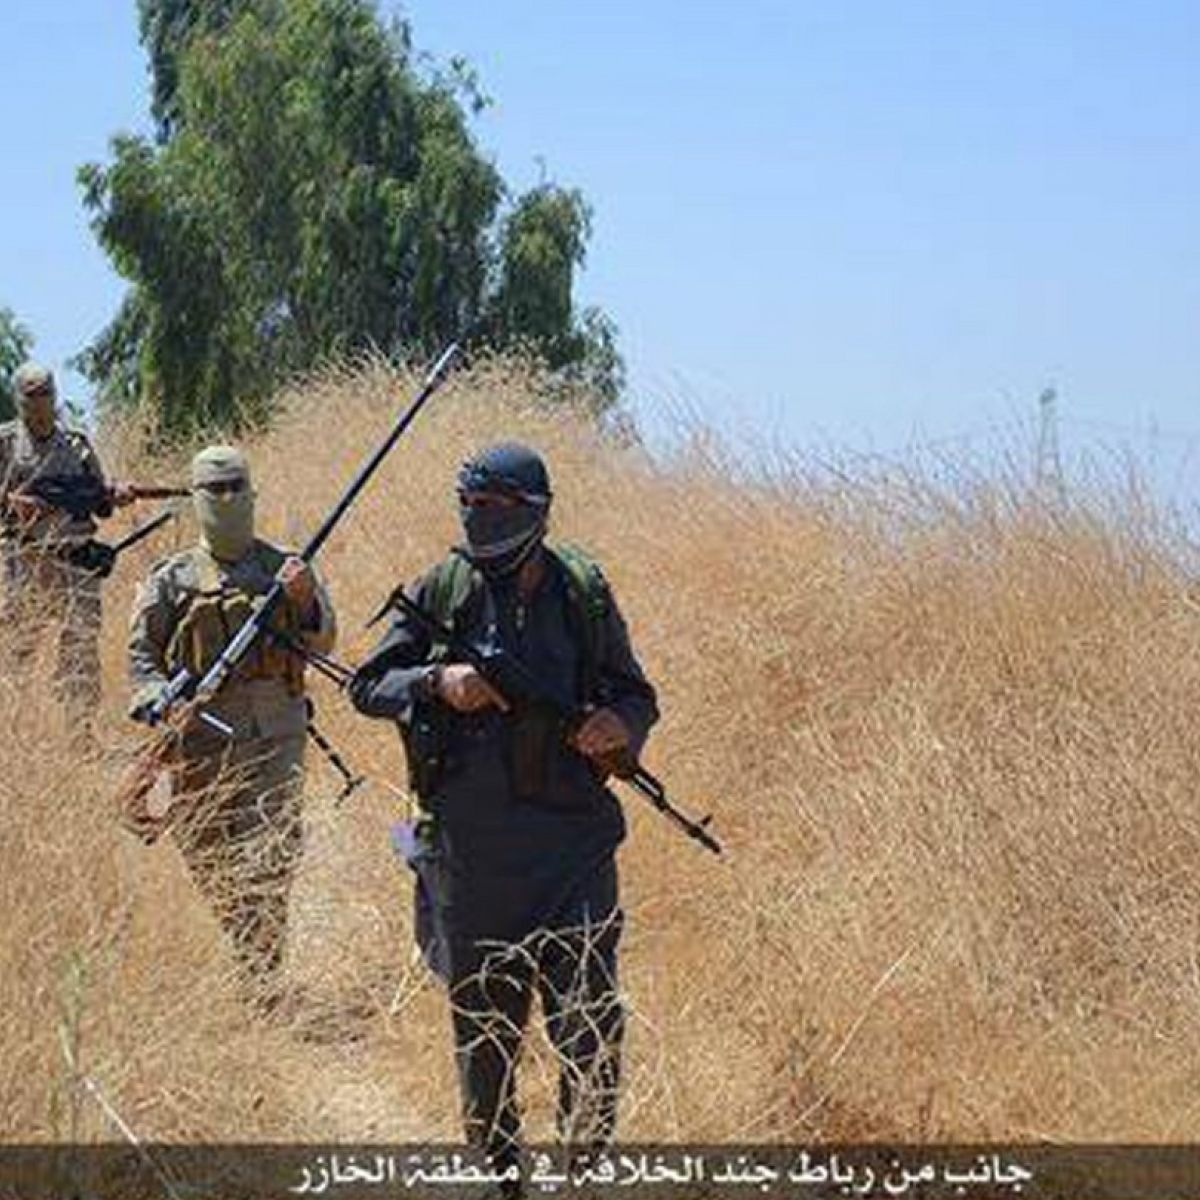 Everybody loves Telegram, including Islamic State's jihadis